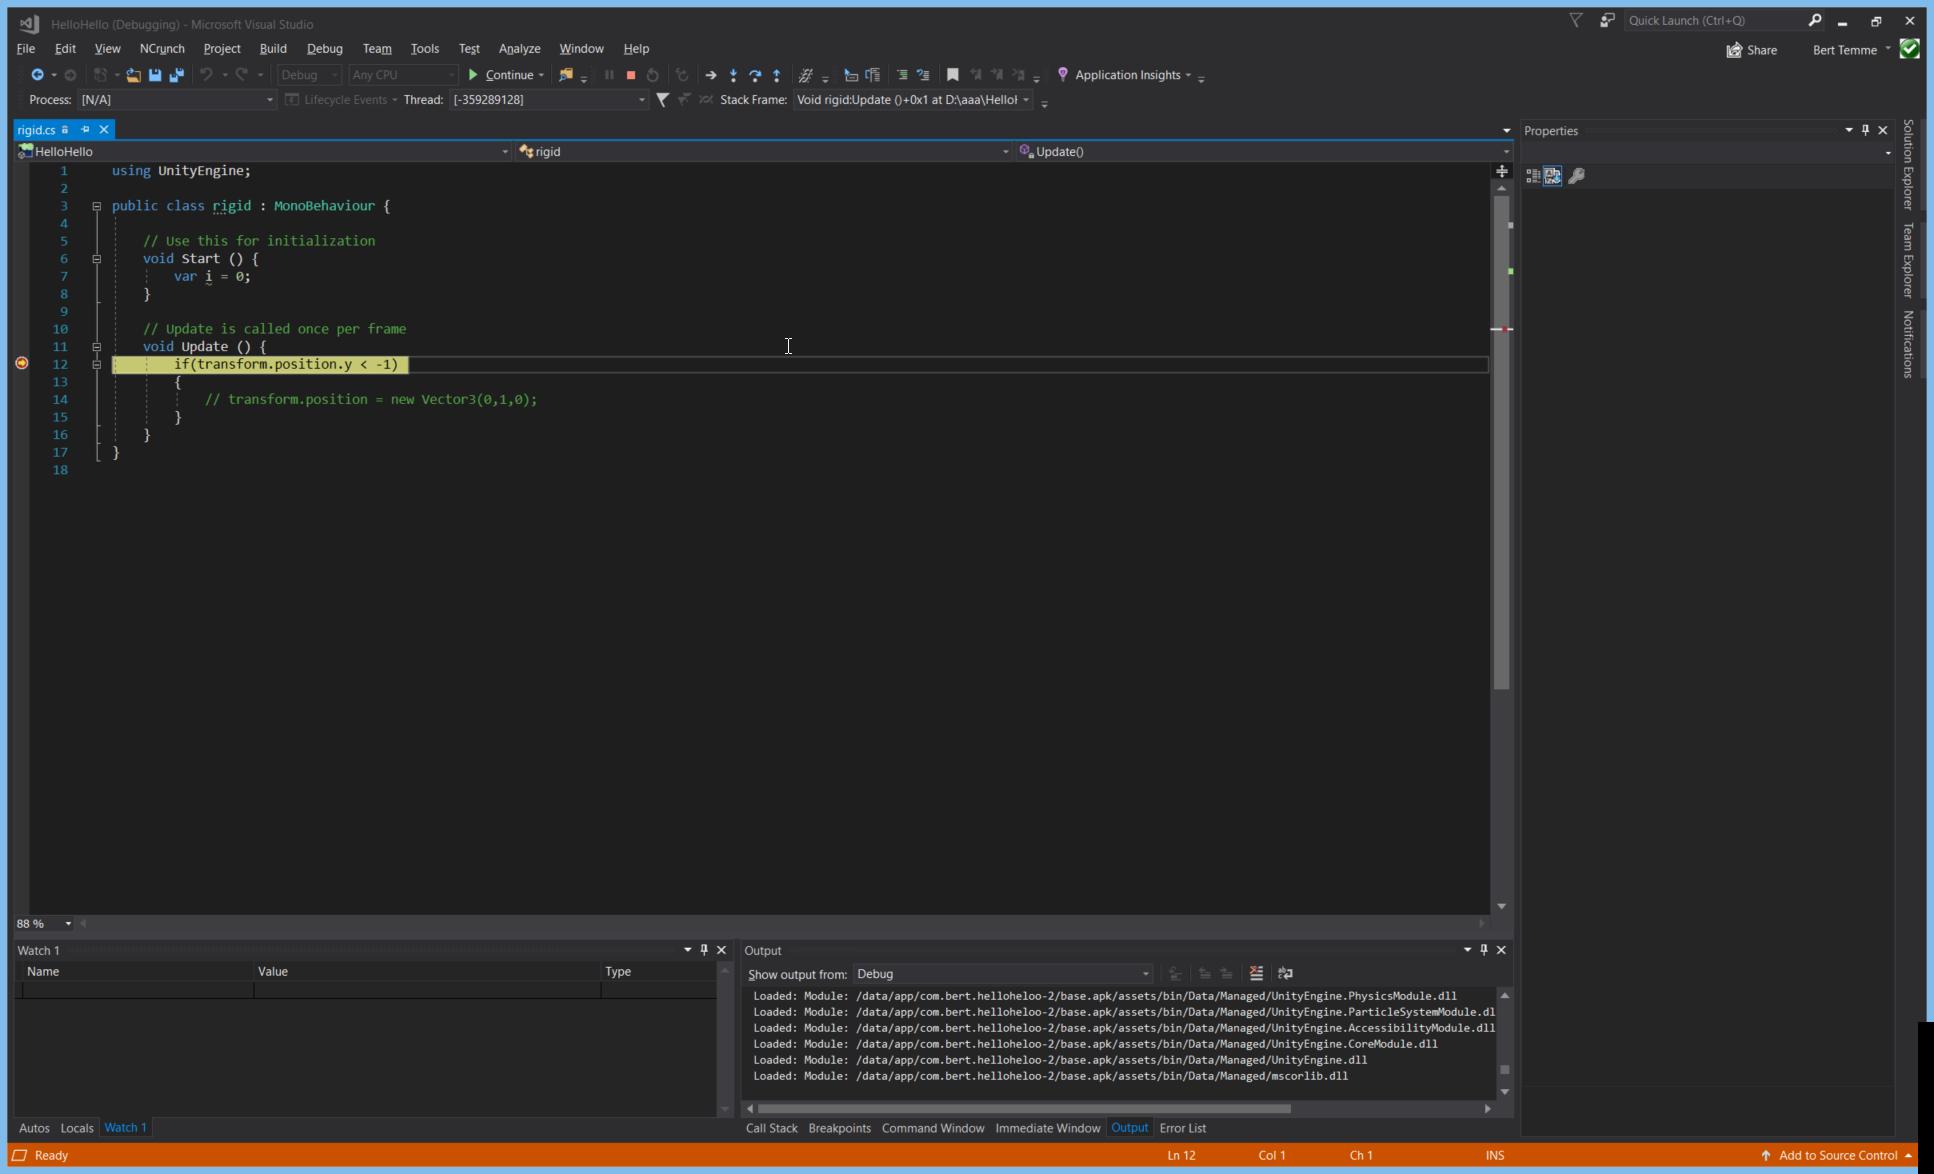 2018_06_12_17_00_20_HelloHello_Debugging_Microsoft_Visual_Studio.png